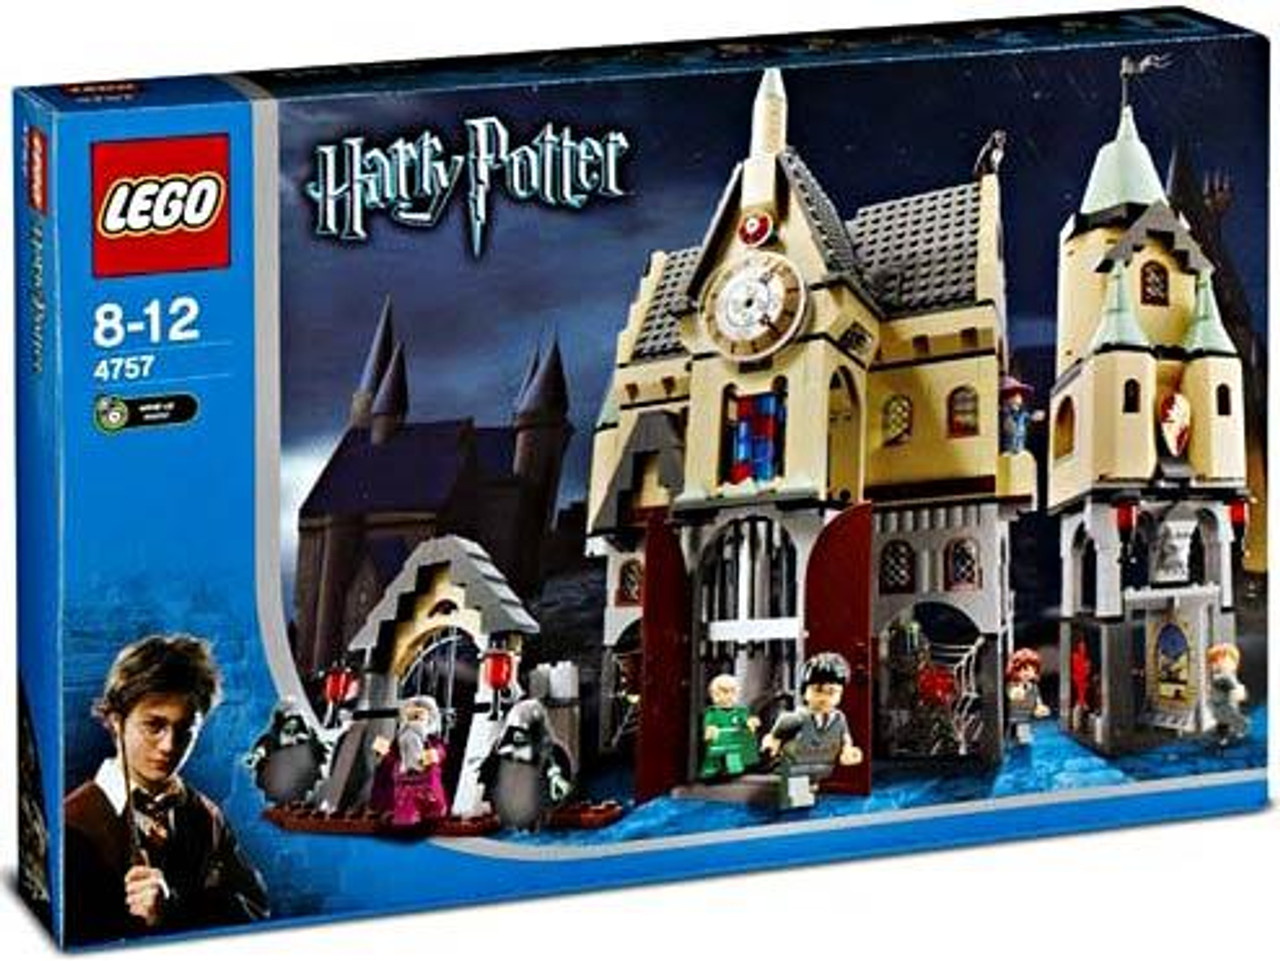 LEGO Harry Potter Prisoner of Azkaban Hogwarts Castle Set #4757